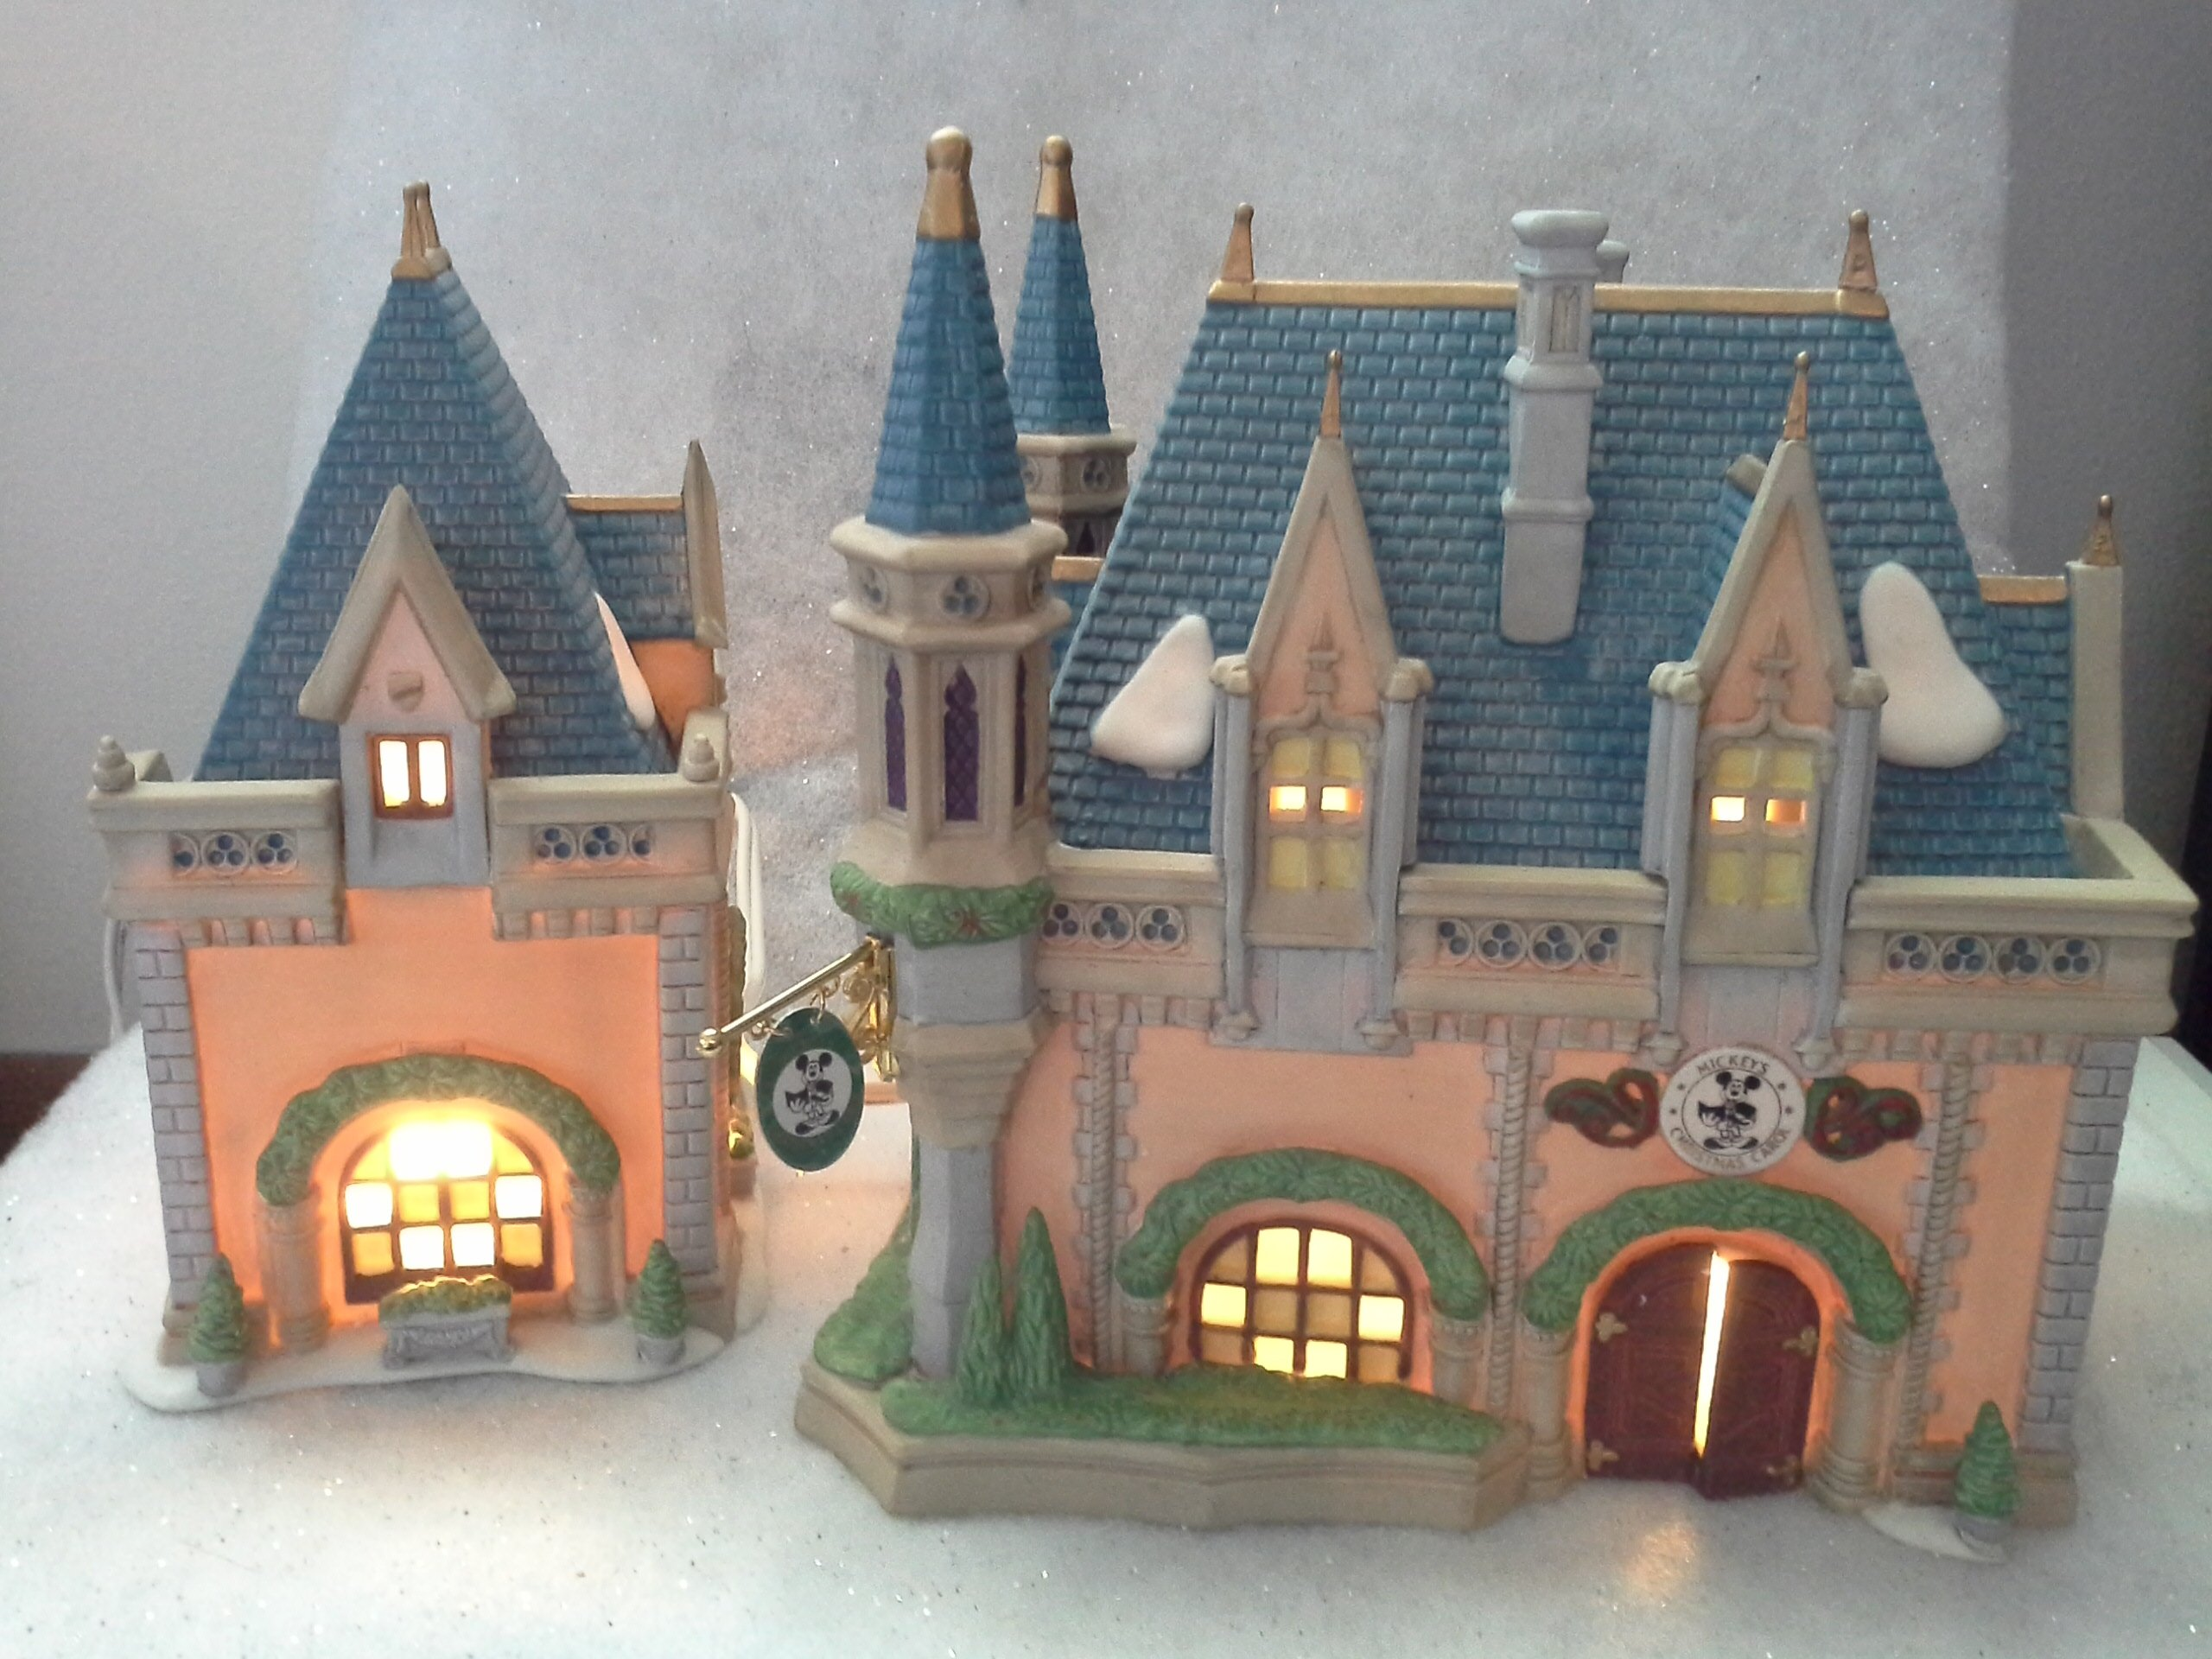 Mickeys Christmas Carol Fantasyland Village Decoration